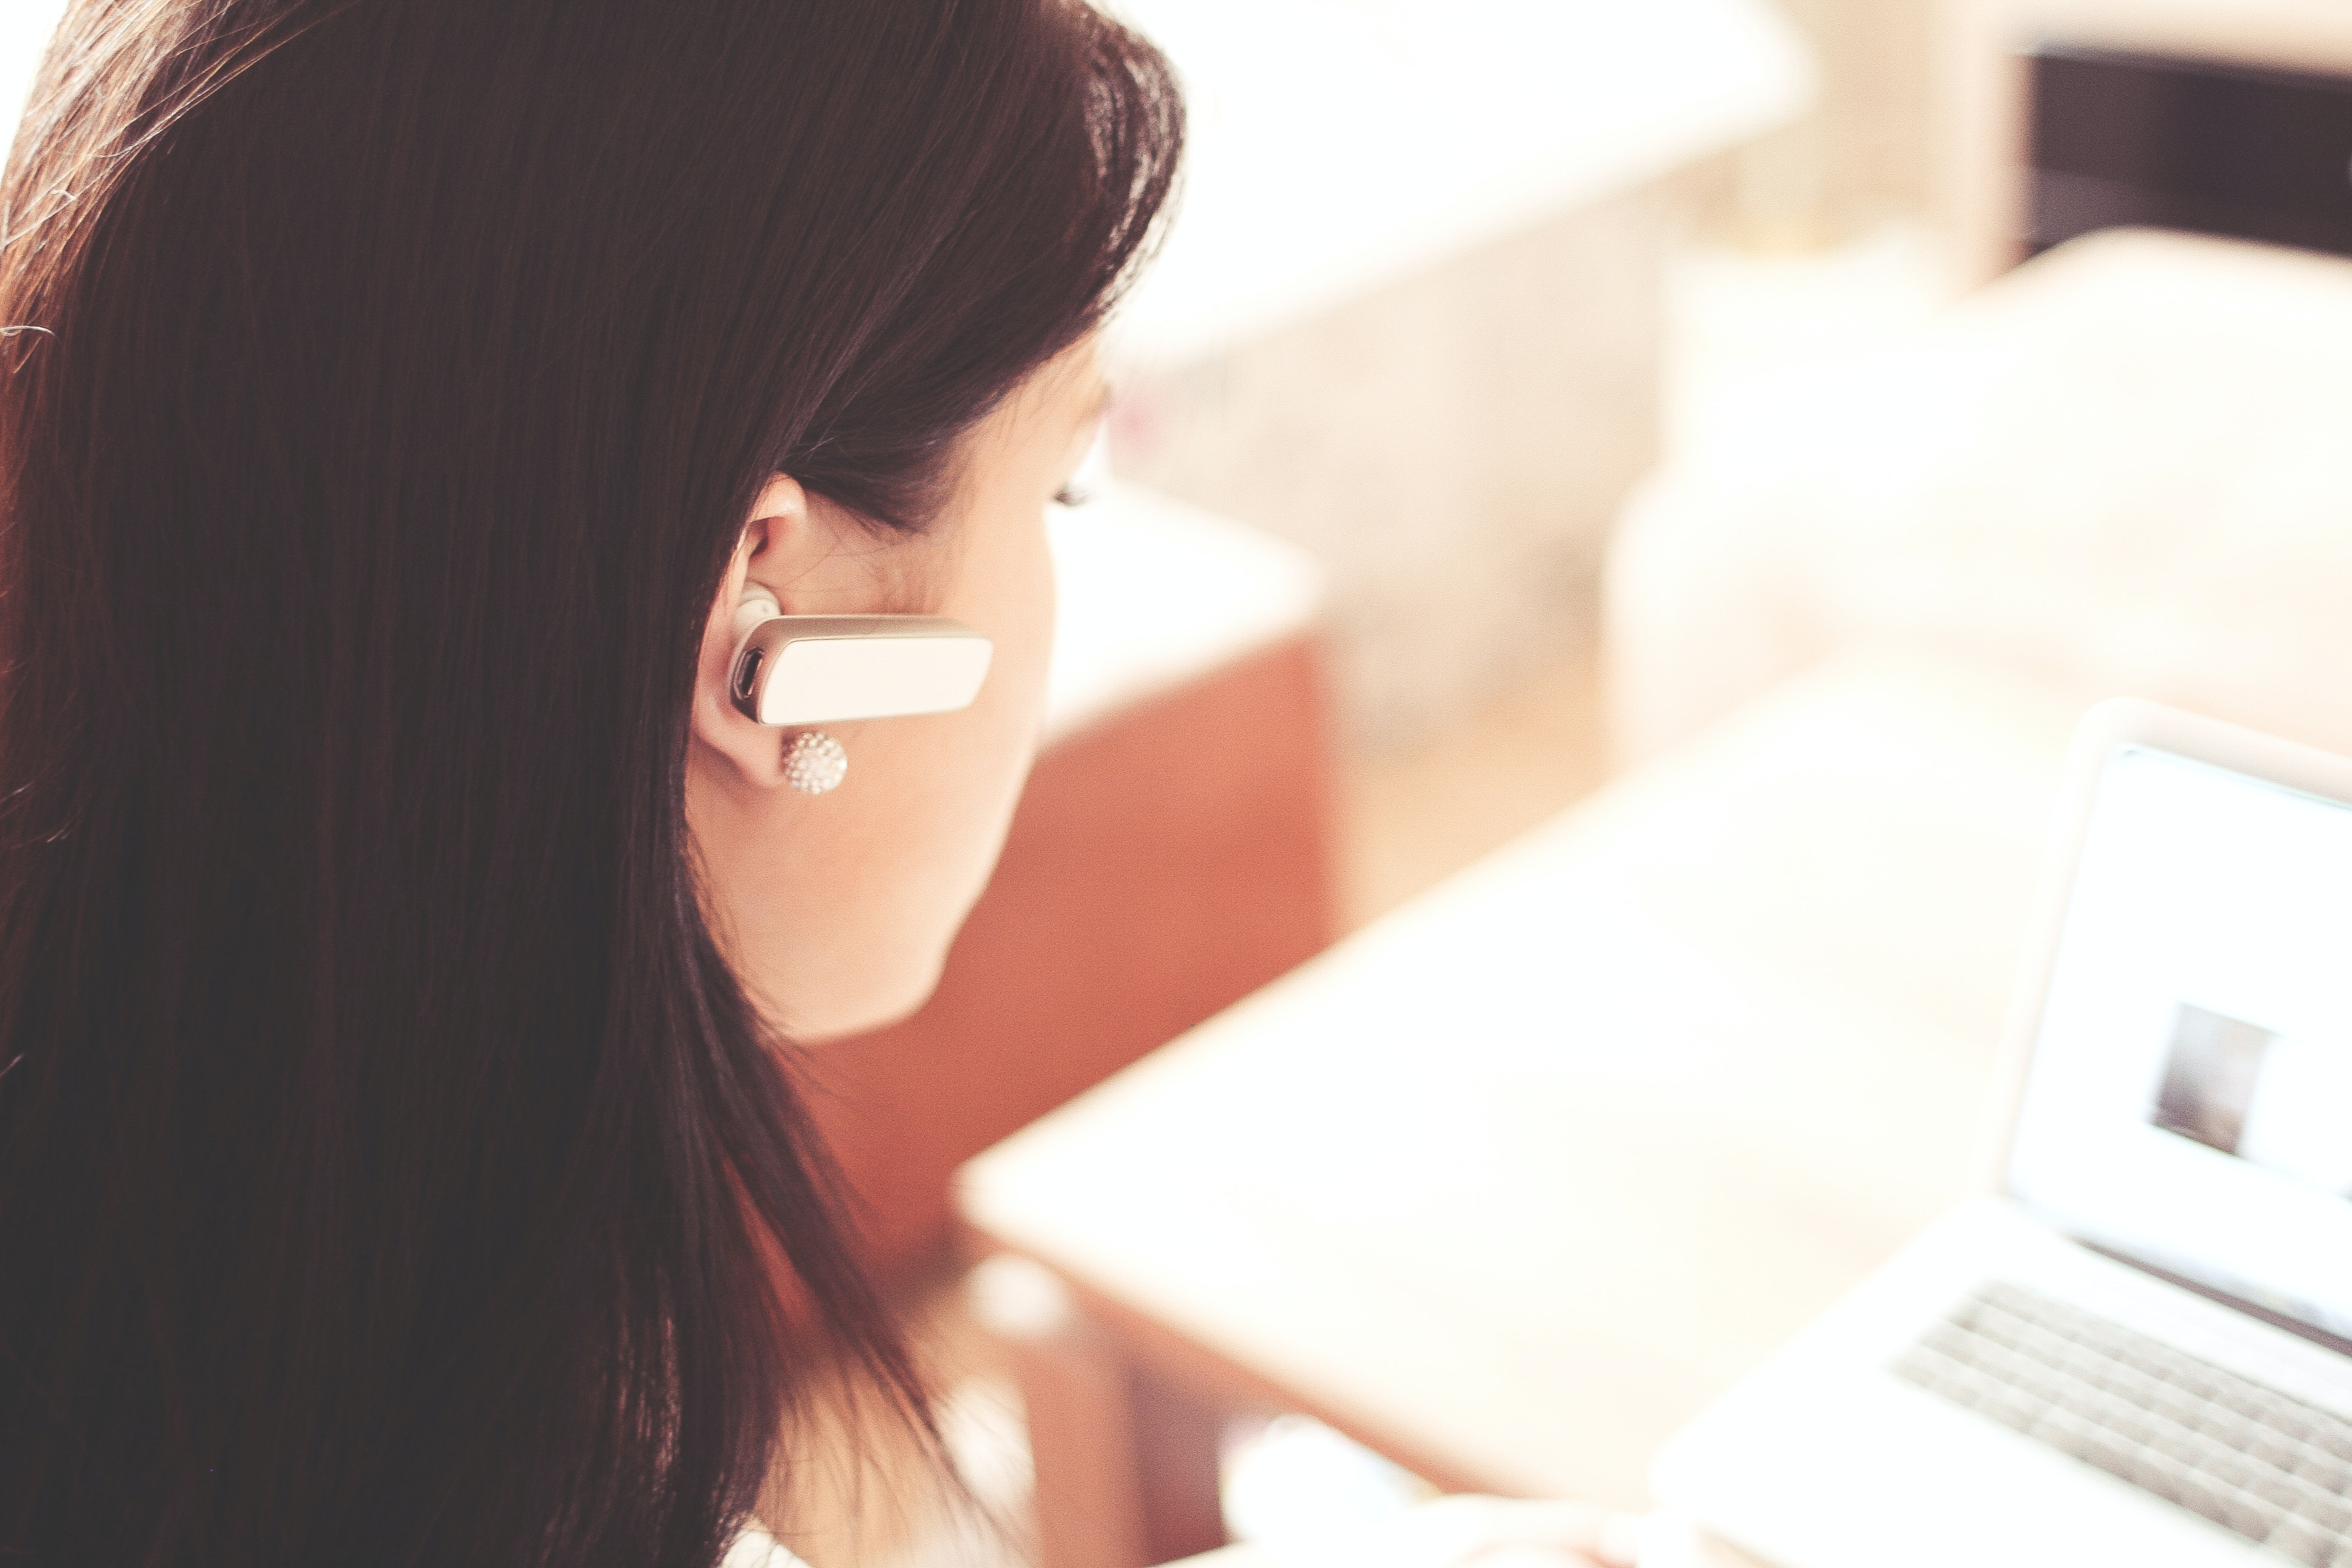 femme au telephone